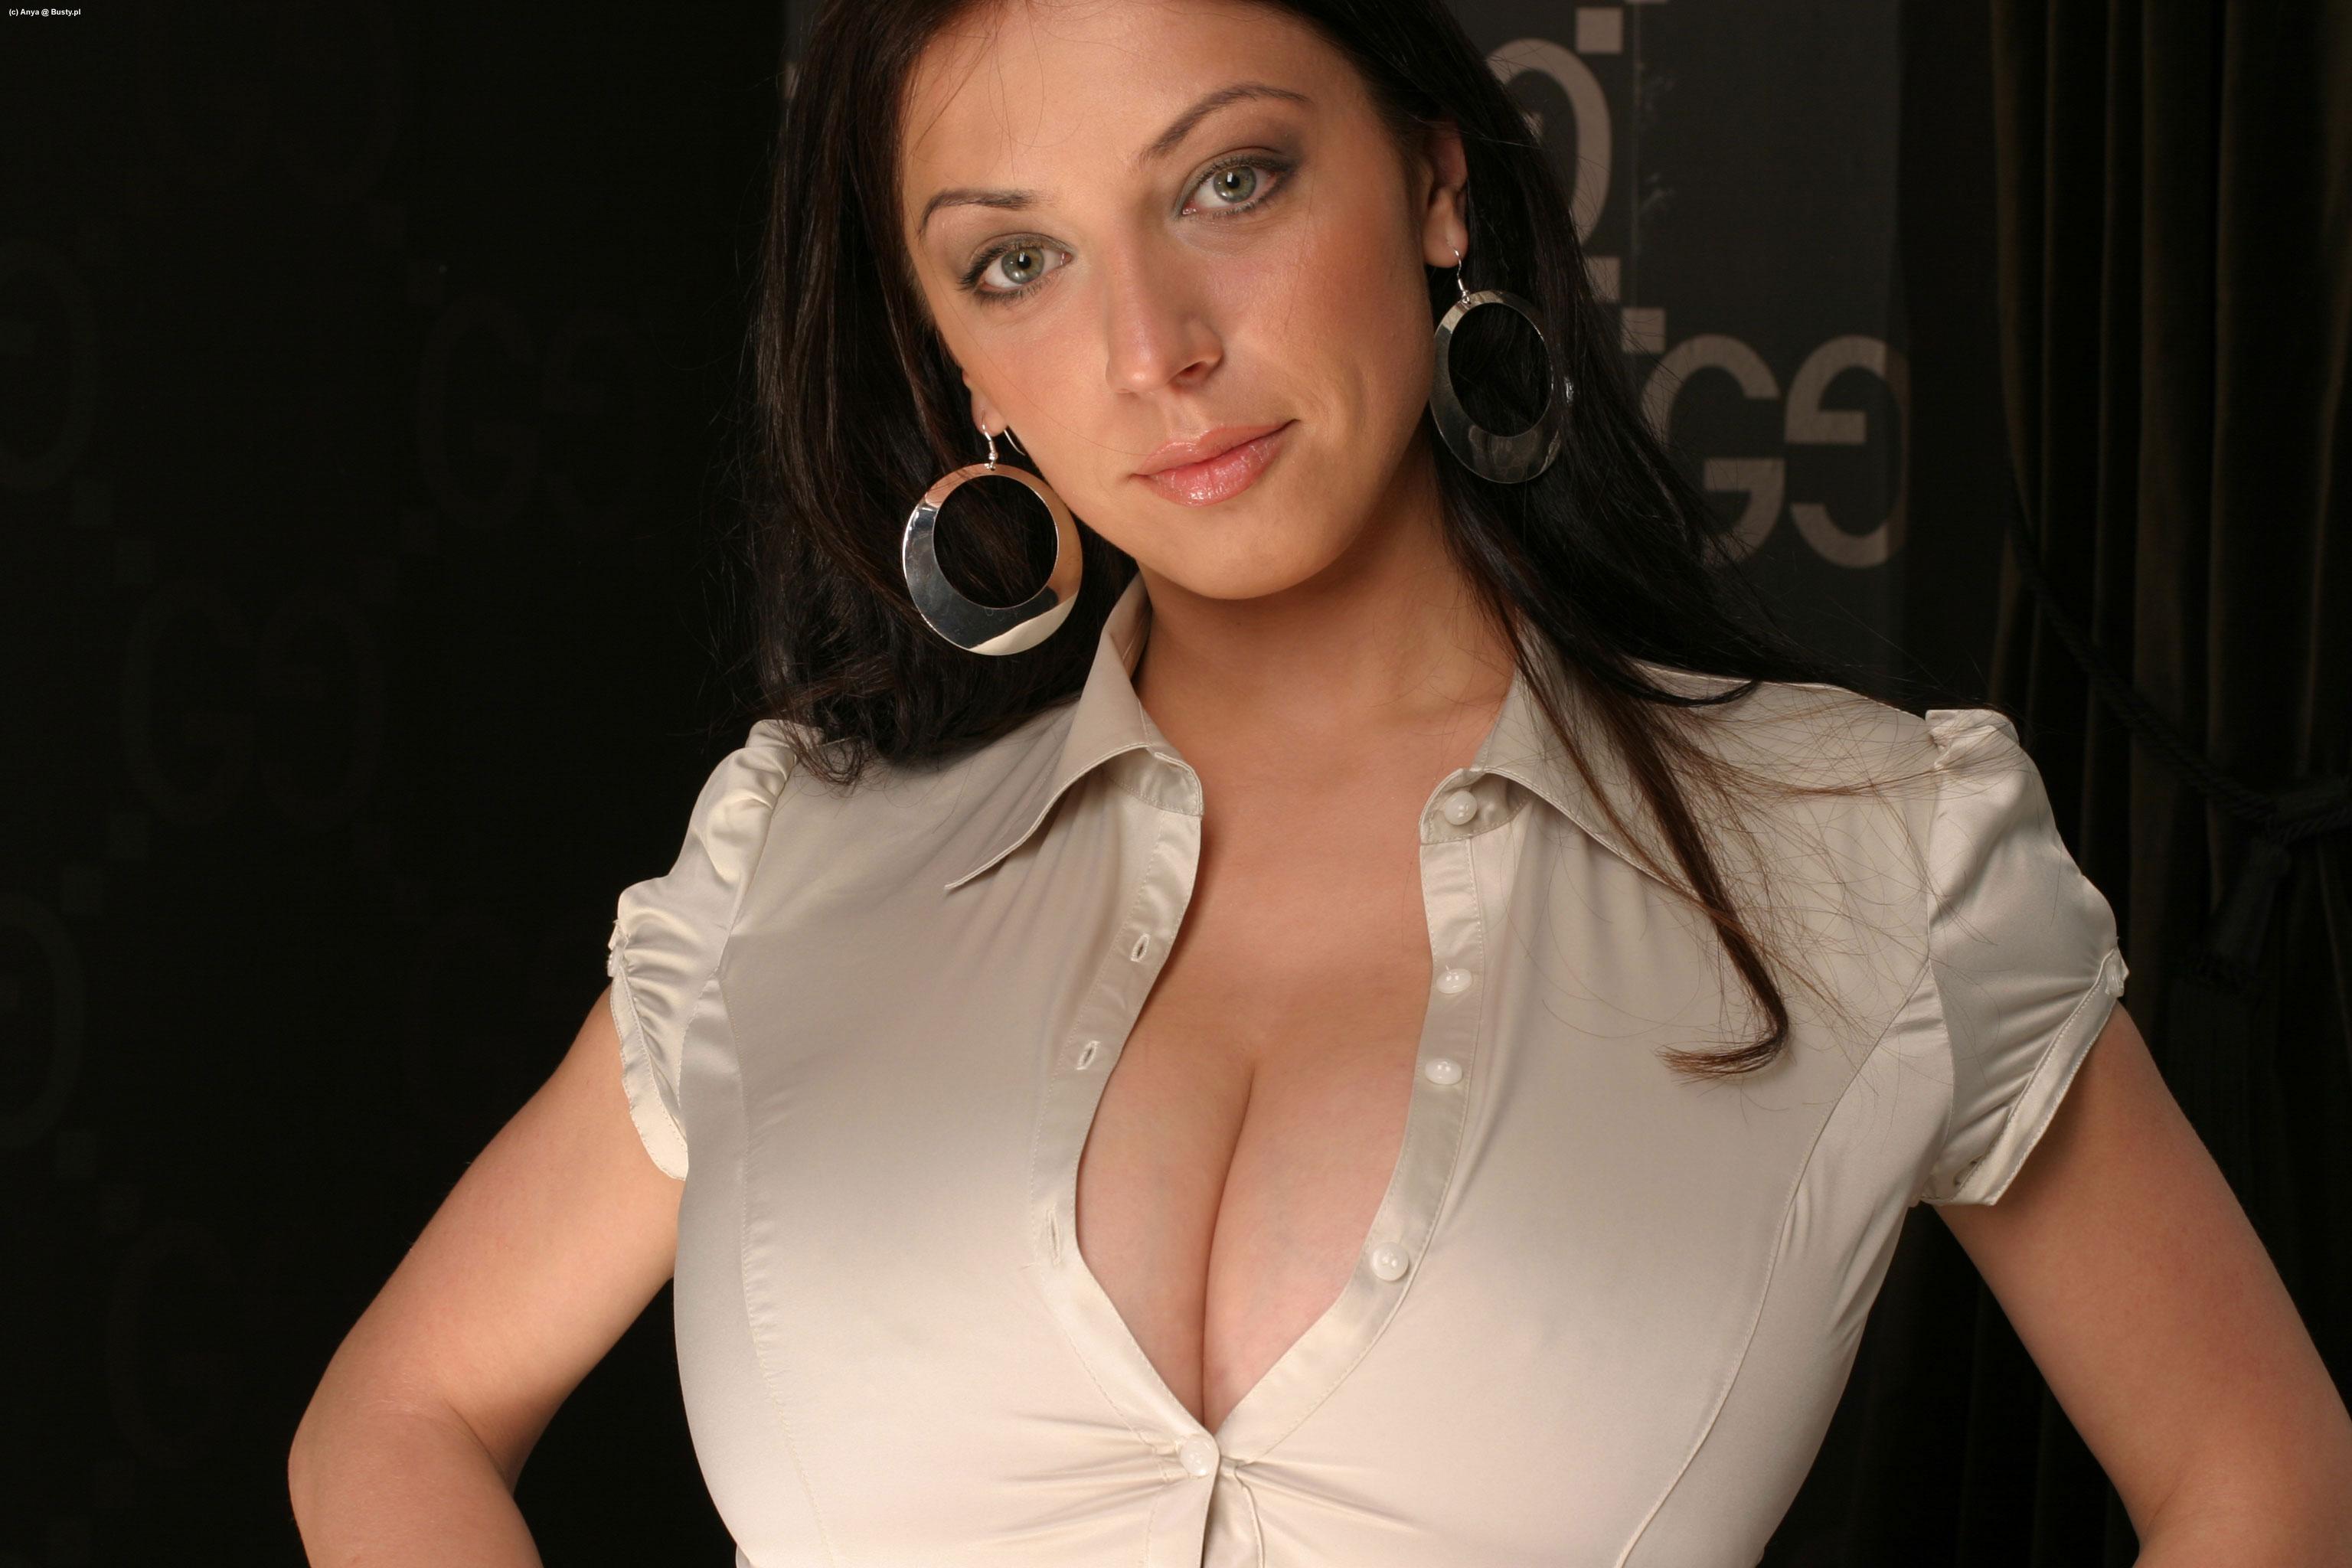 Tight blouse button pop